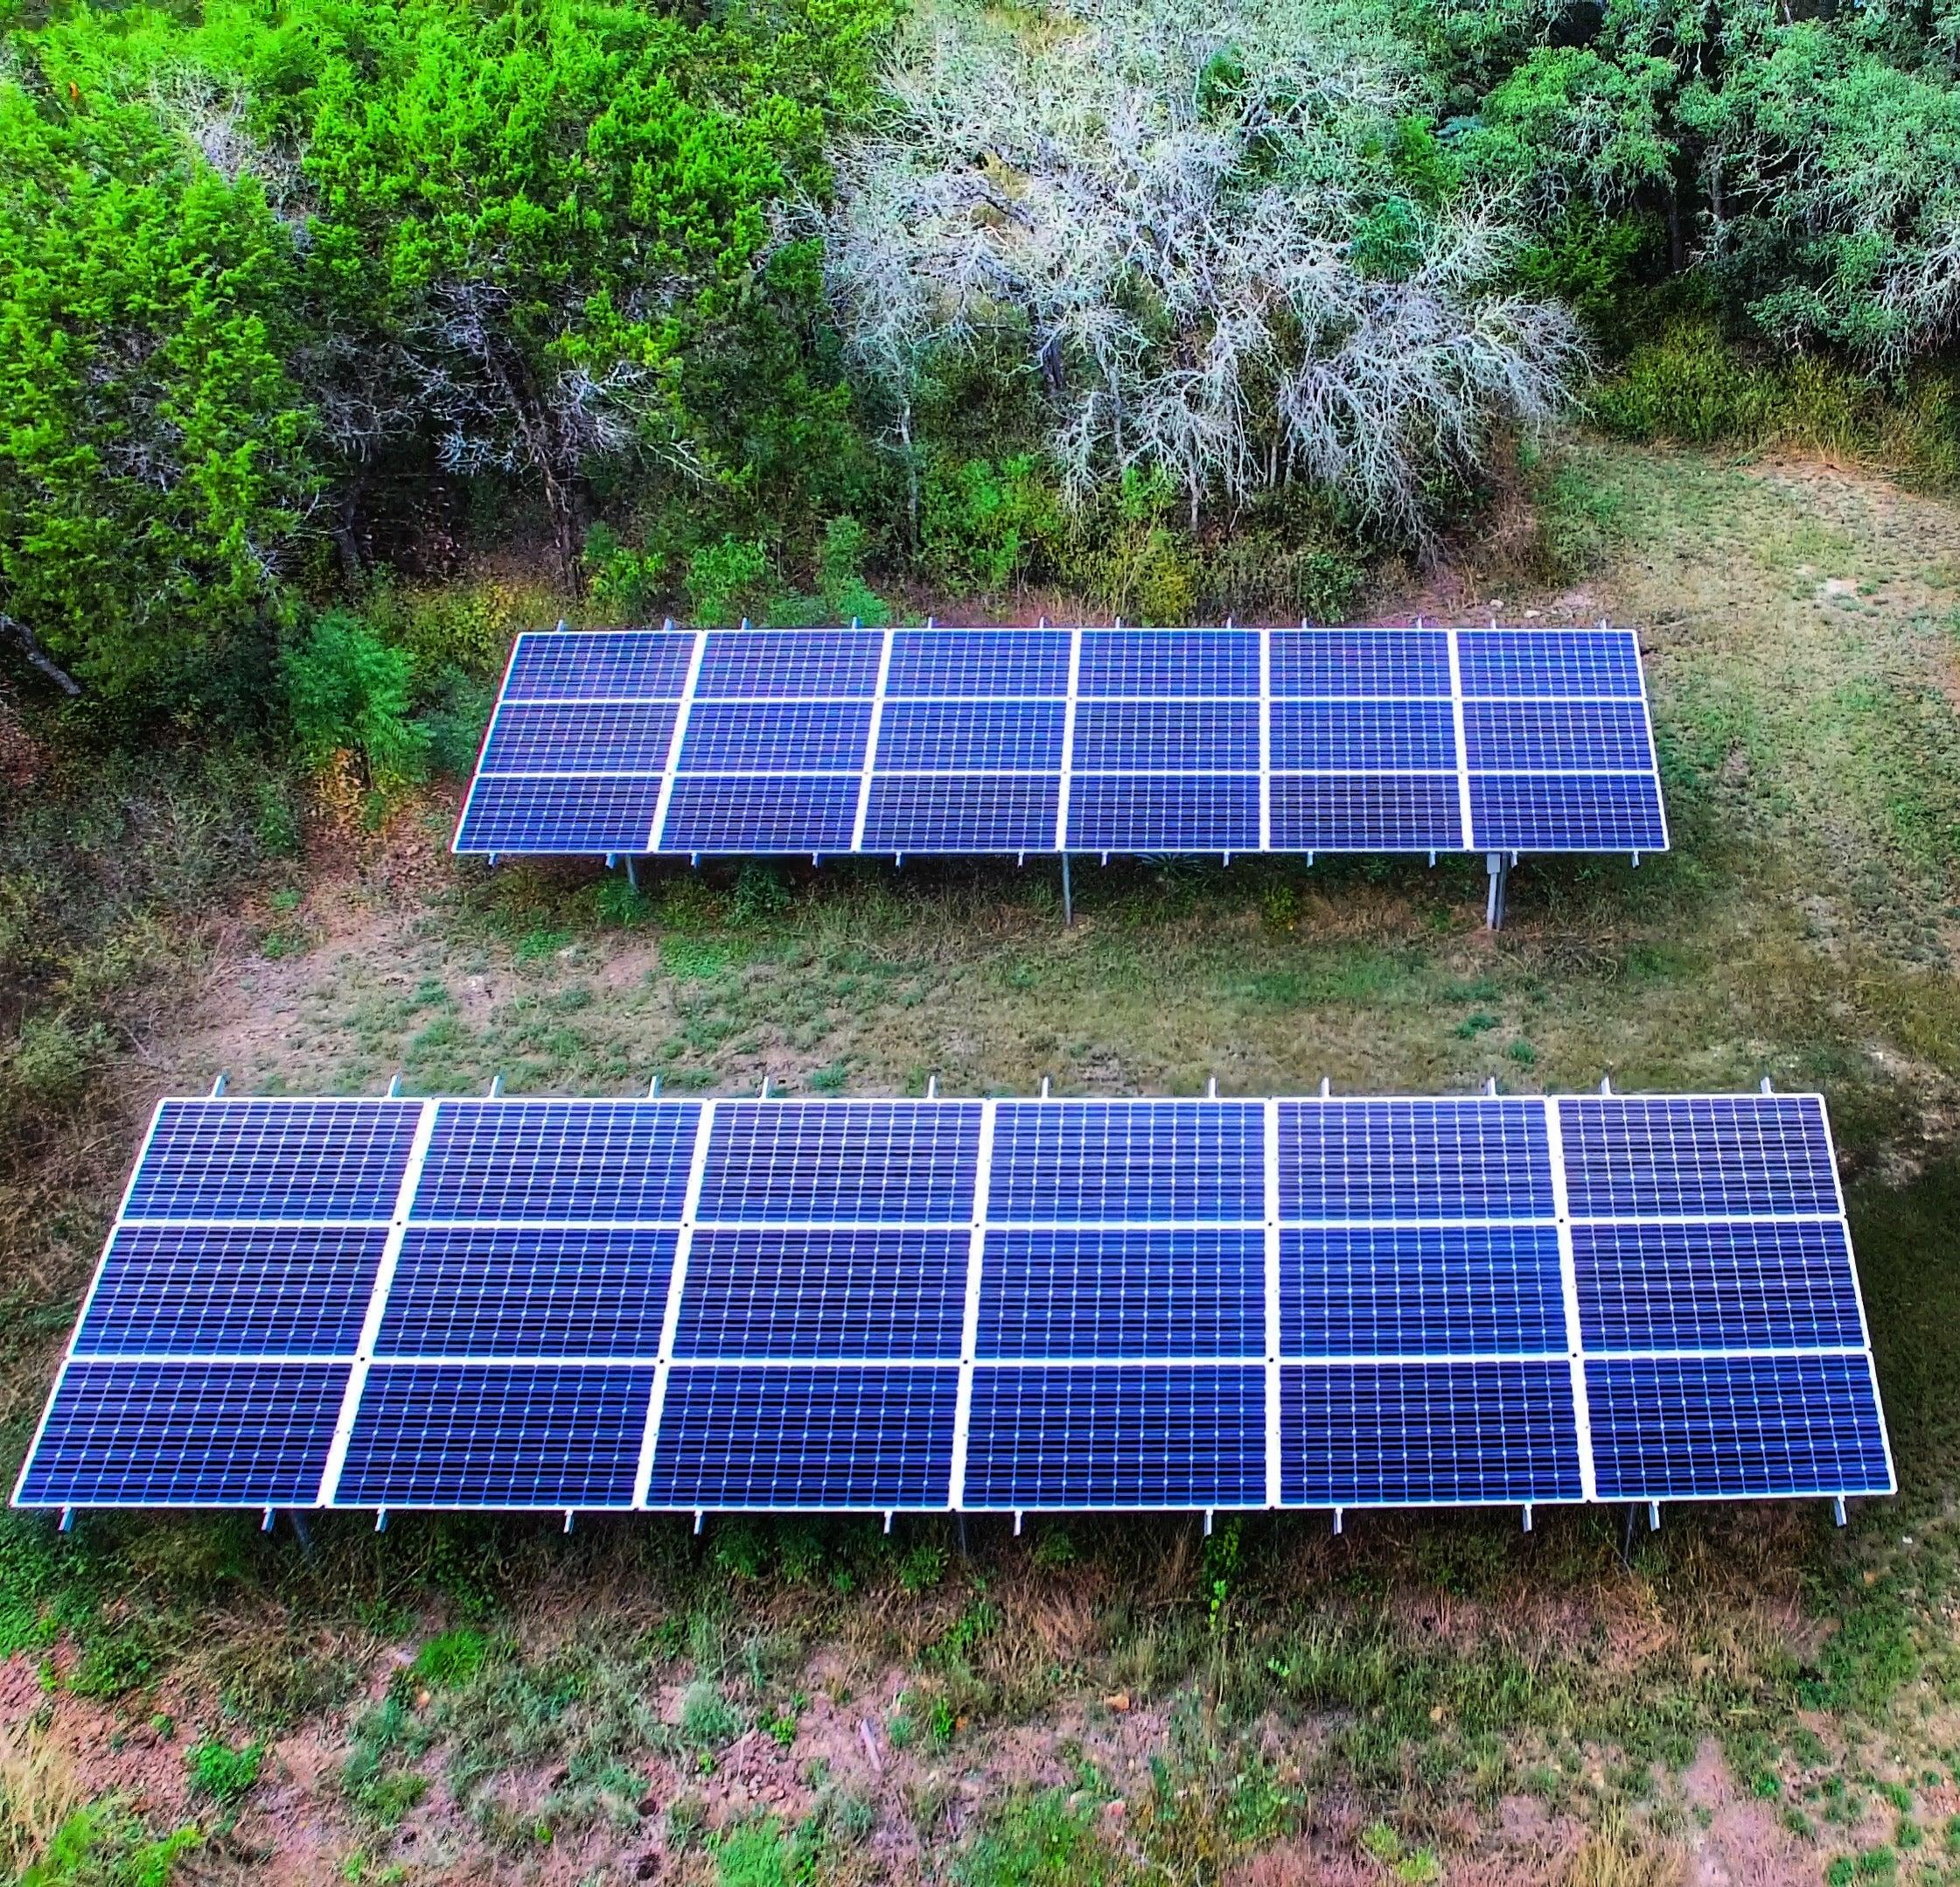 Residential Ground Mount Solar Array - Austin, Texas